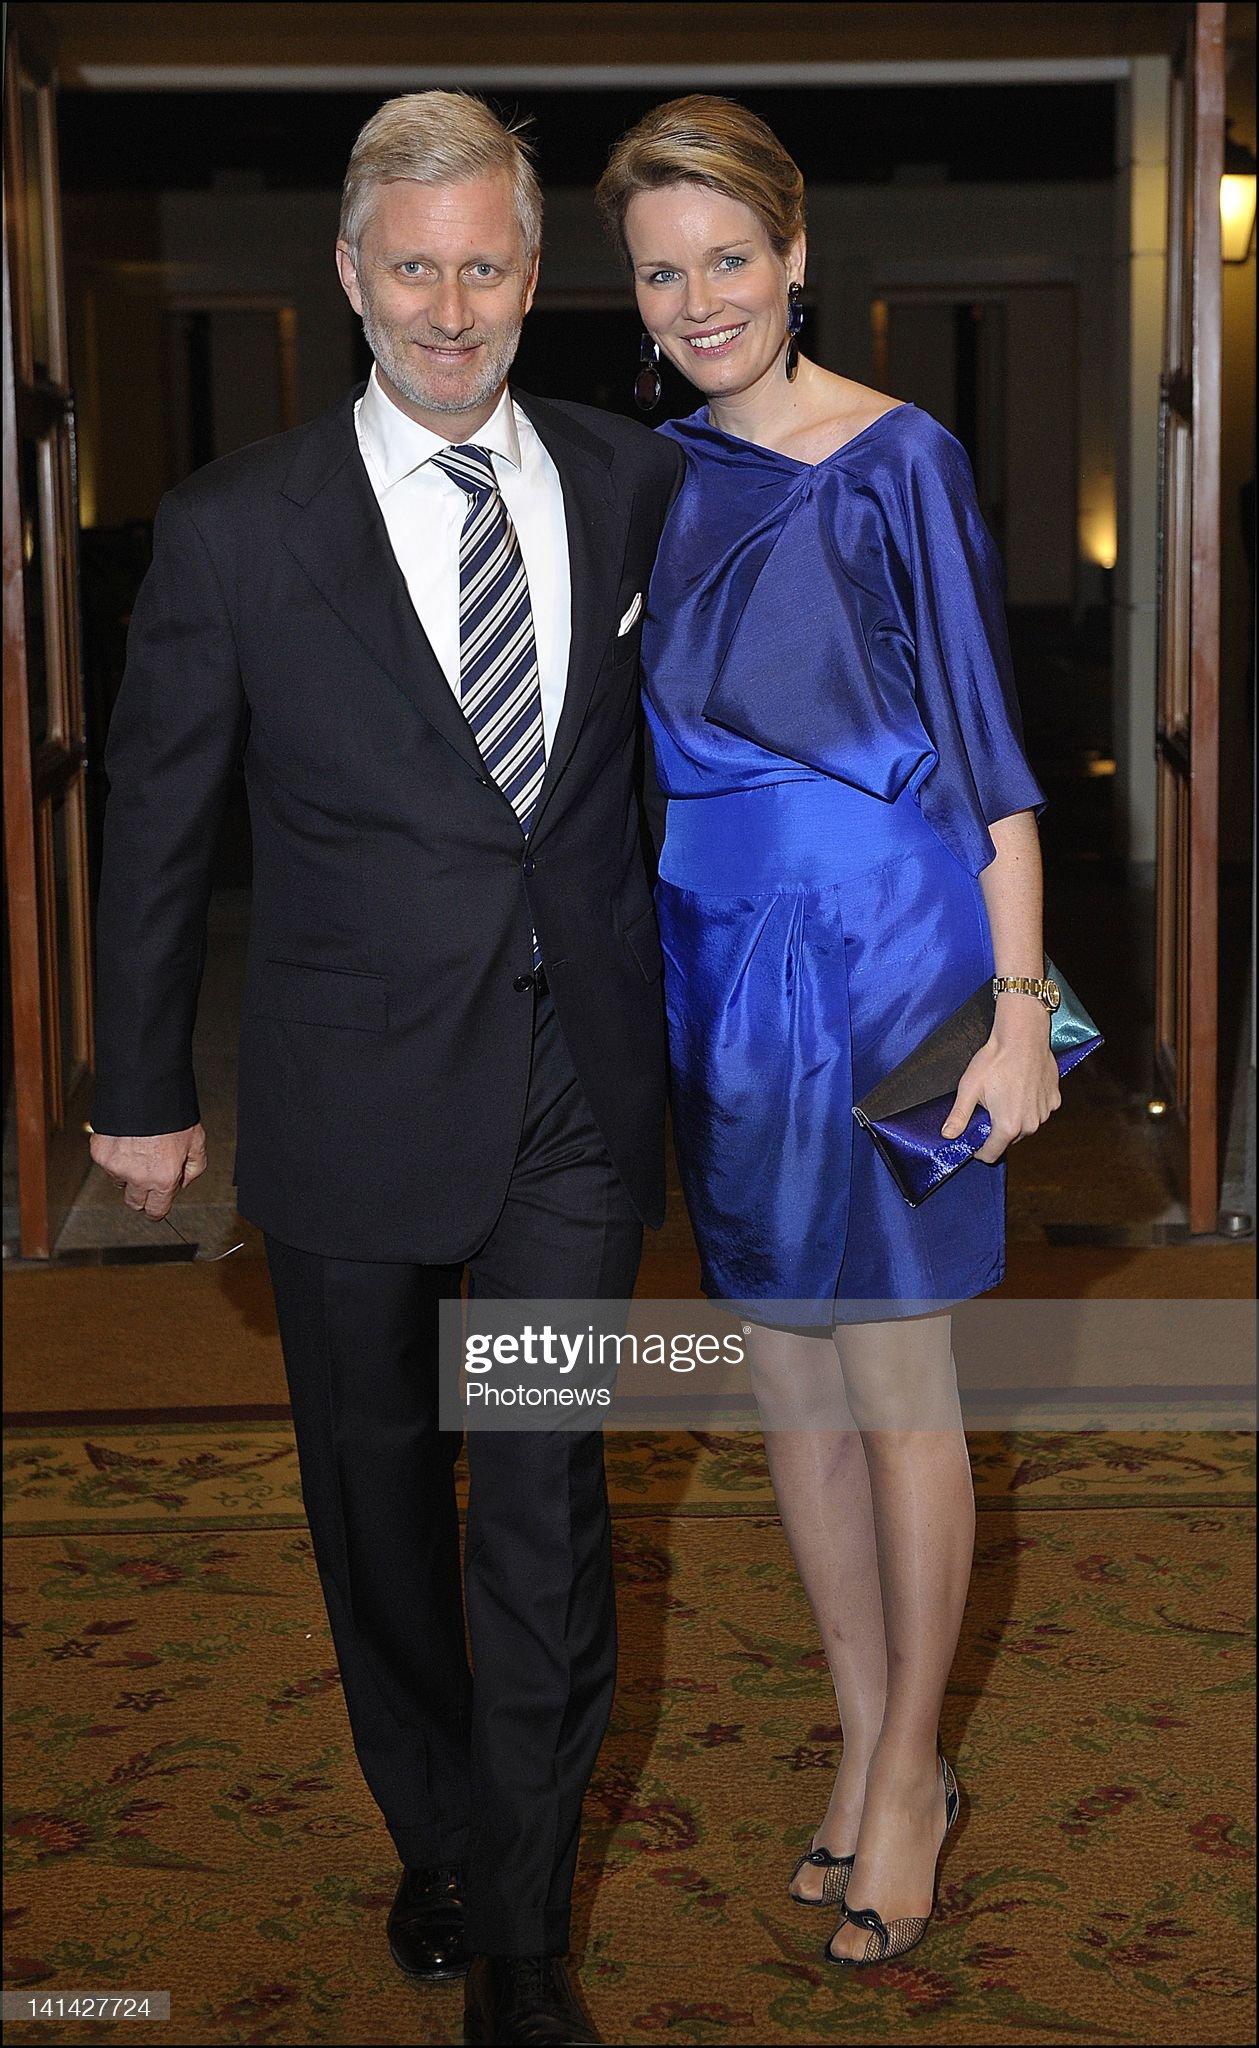 Вечерние наряды Королевы Матильды Prince Philip and Princess Mathilde of Belgium Official Visit to Vietnam - Day 3 : News Photo